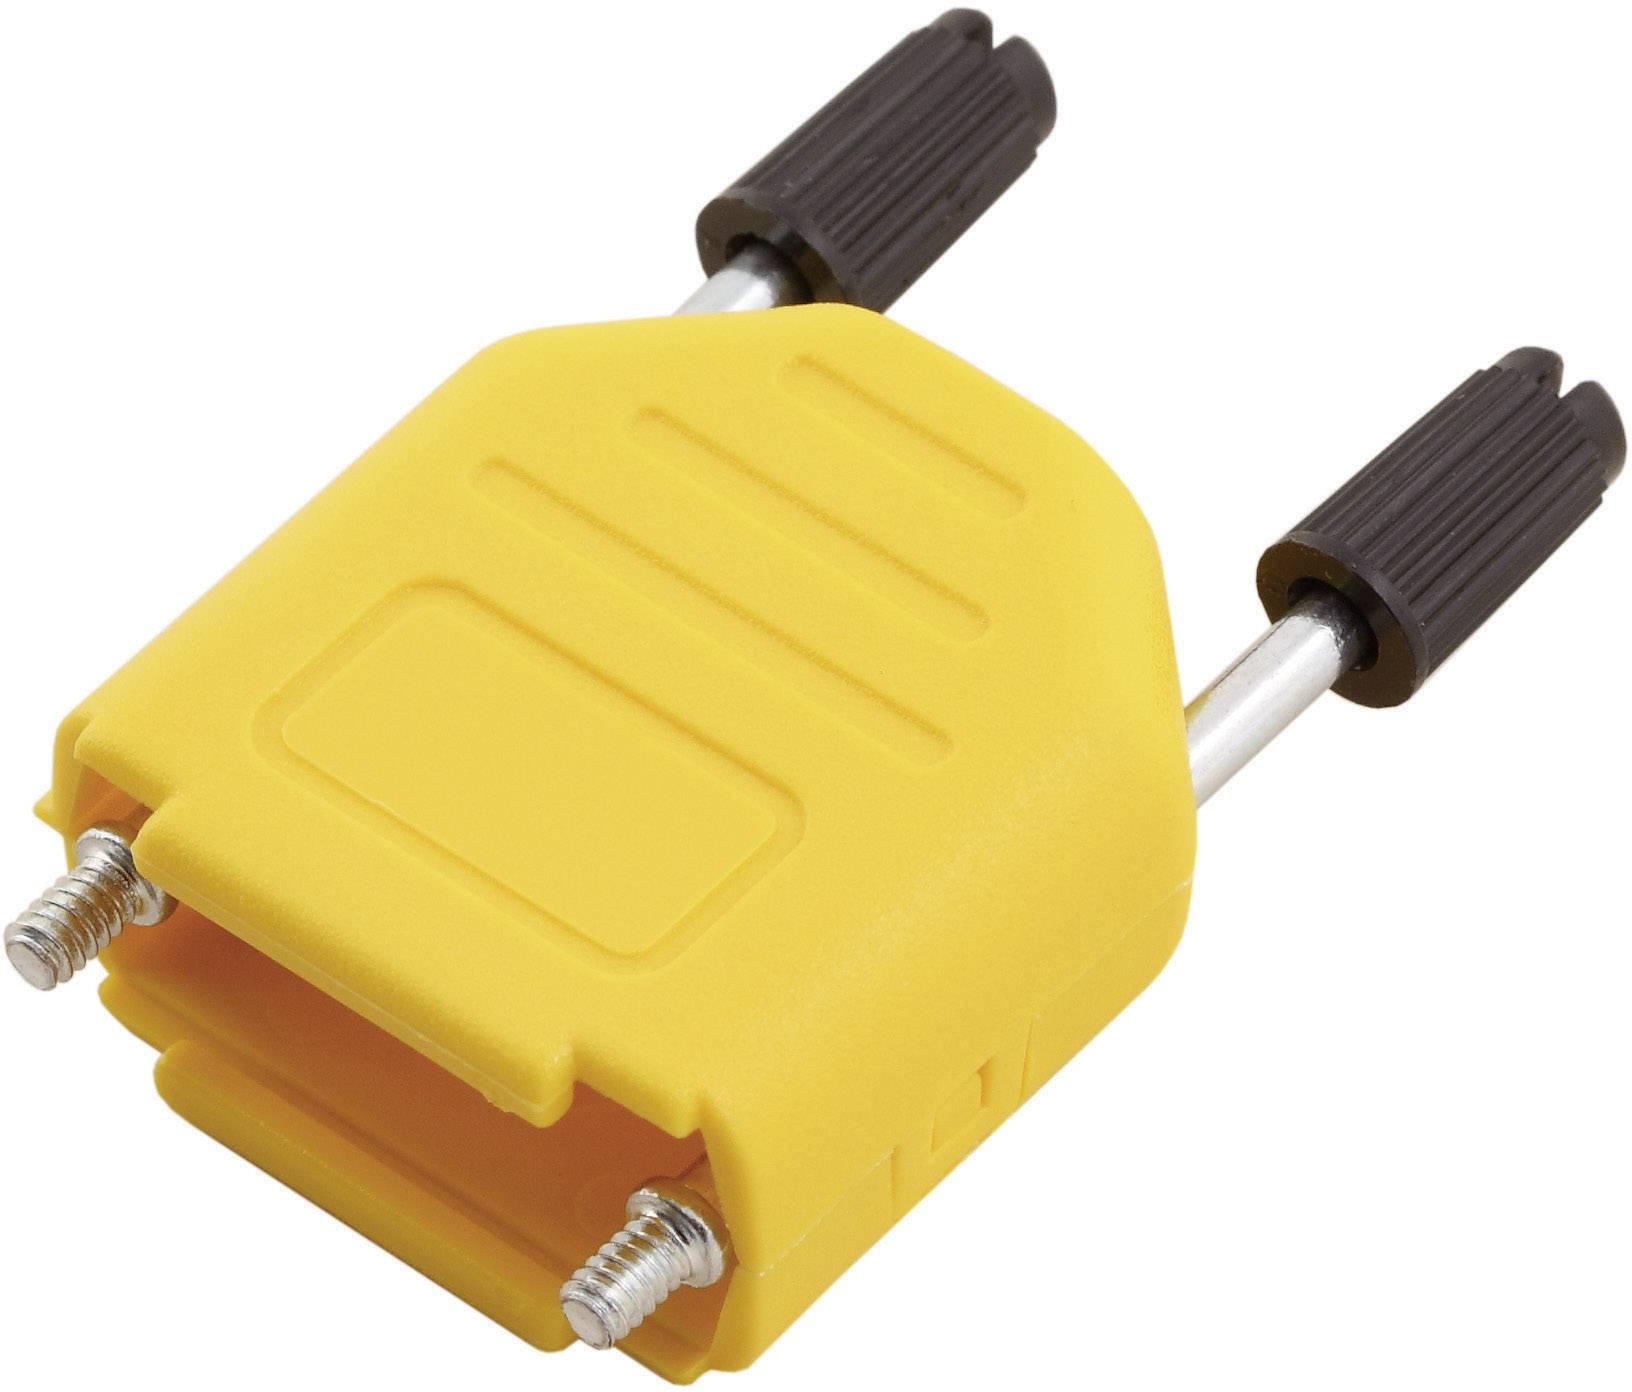 D-SUB púzdro MH Connectors MHDPPK37-Y-K 6353-0105-04, Počet pinov: 37, plast, 180 °, žltá, 1 ks